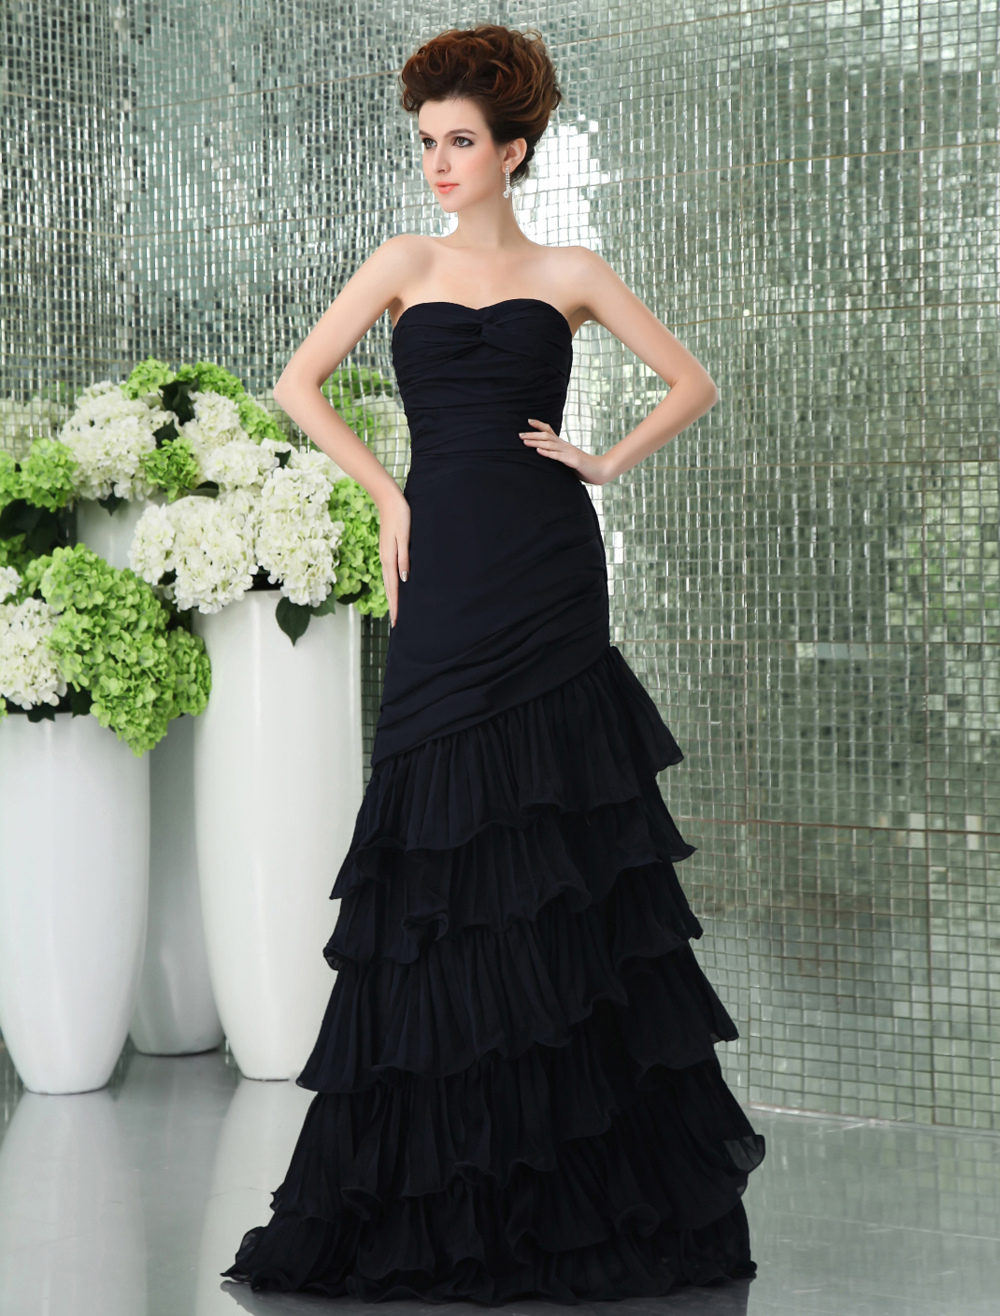 Sweetheart Dark Navy Blue Chiffon Floor Length Prom Dress (Wedding Prom Dresses) photo